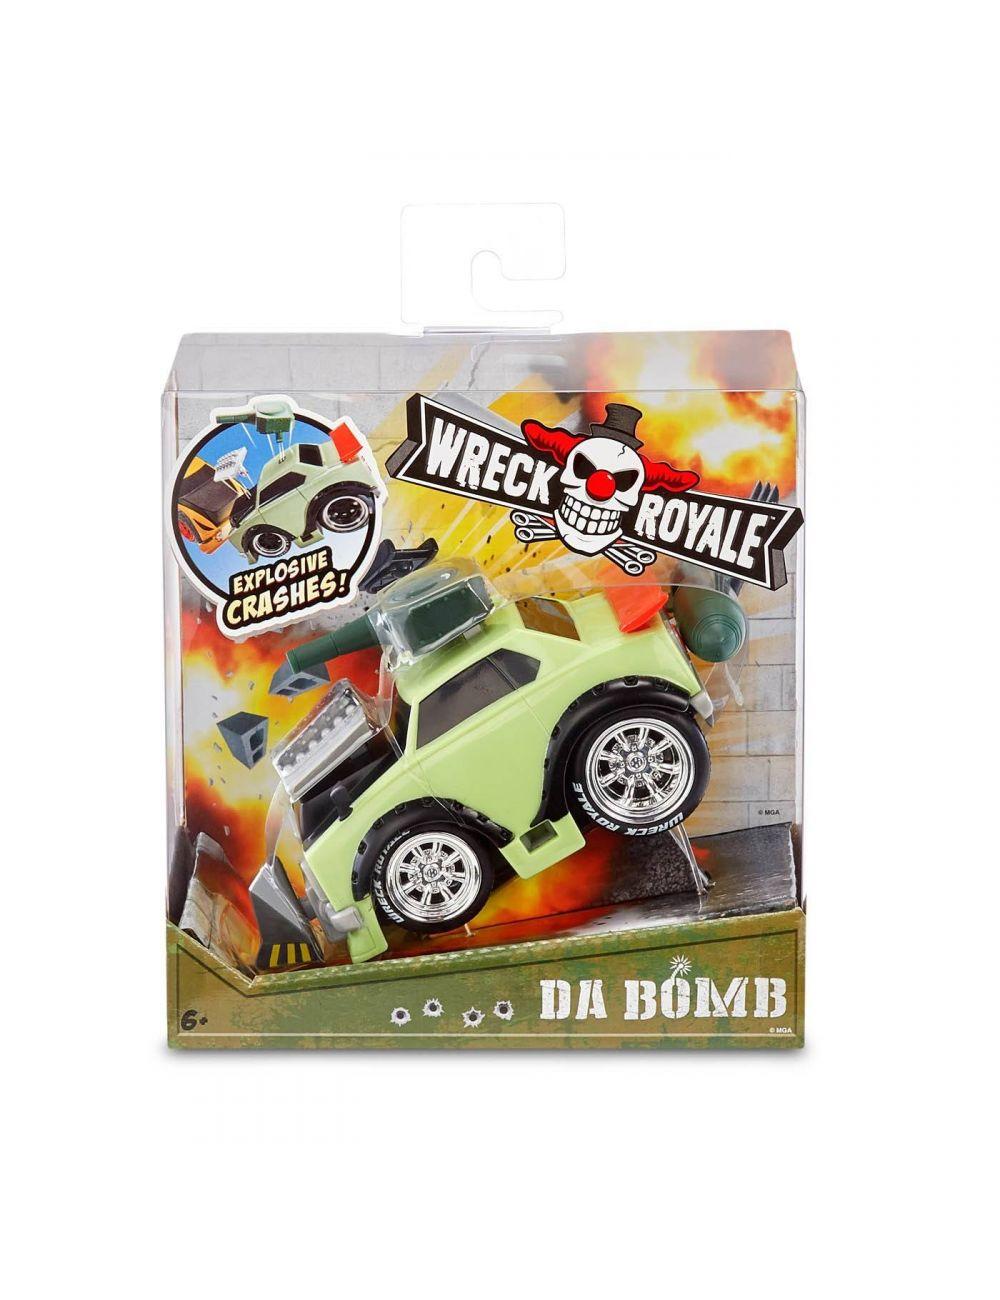 Wreck Royale da bomb pudełko box